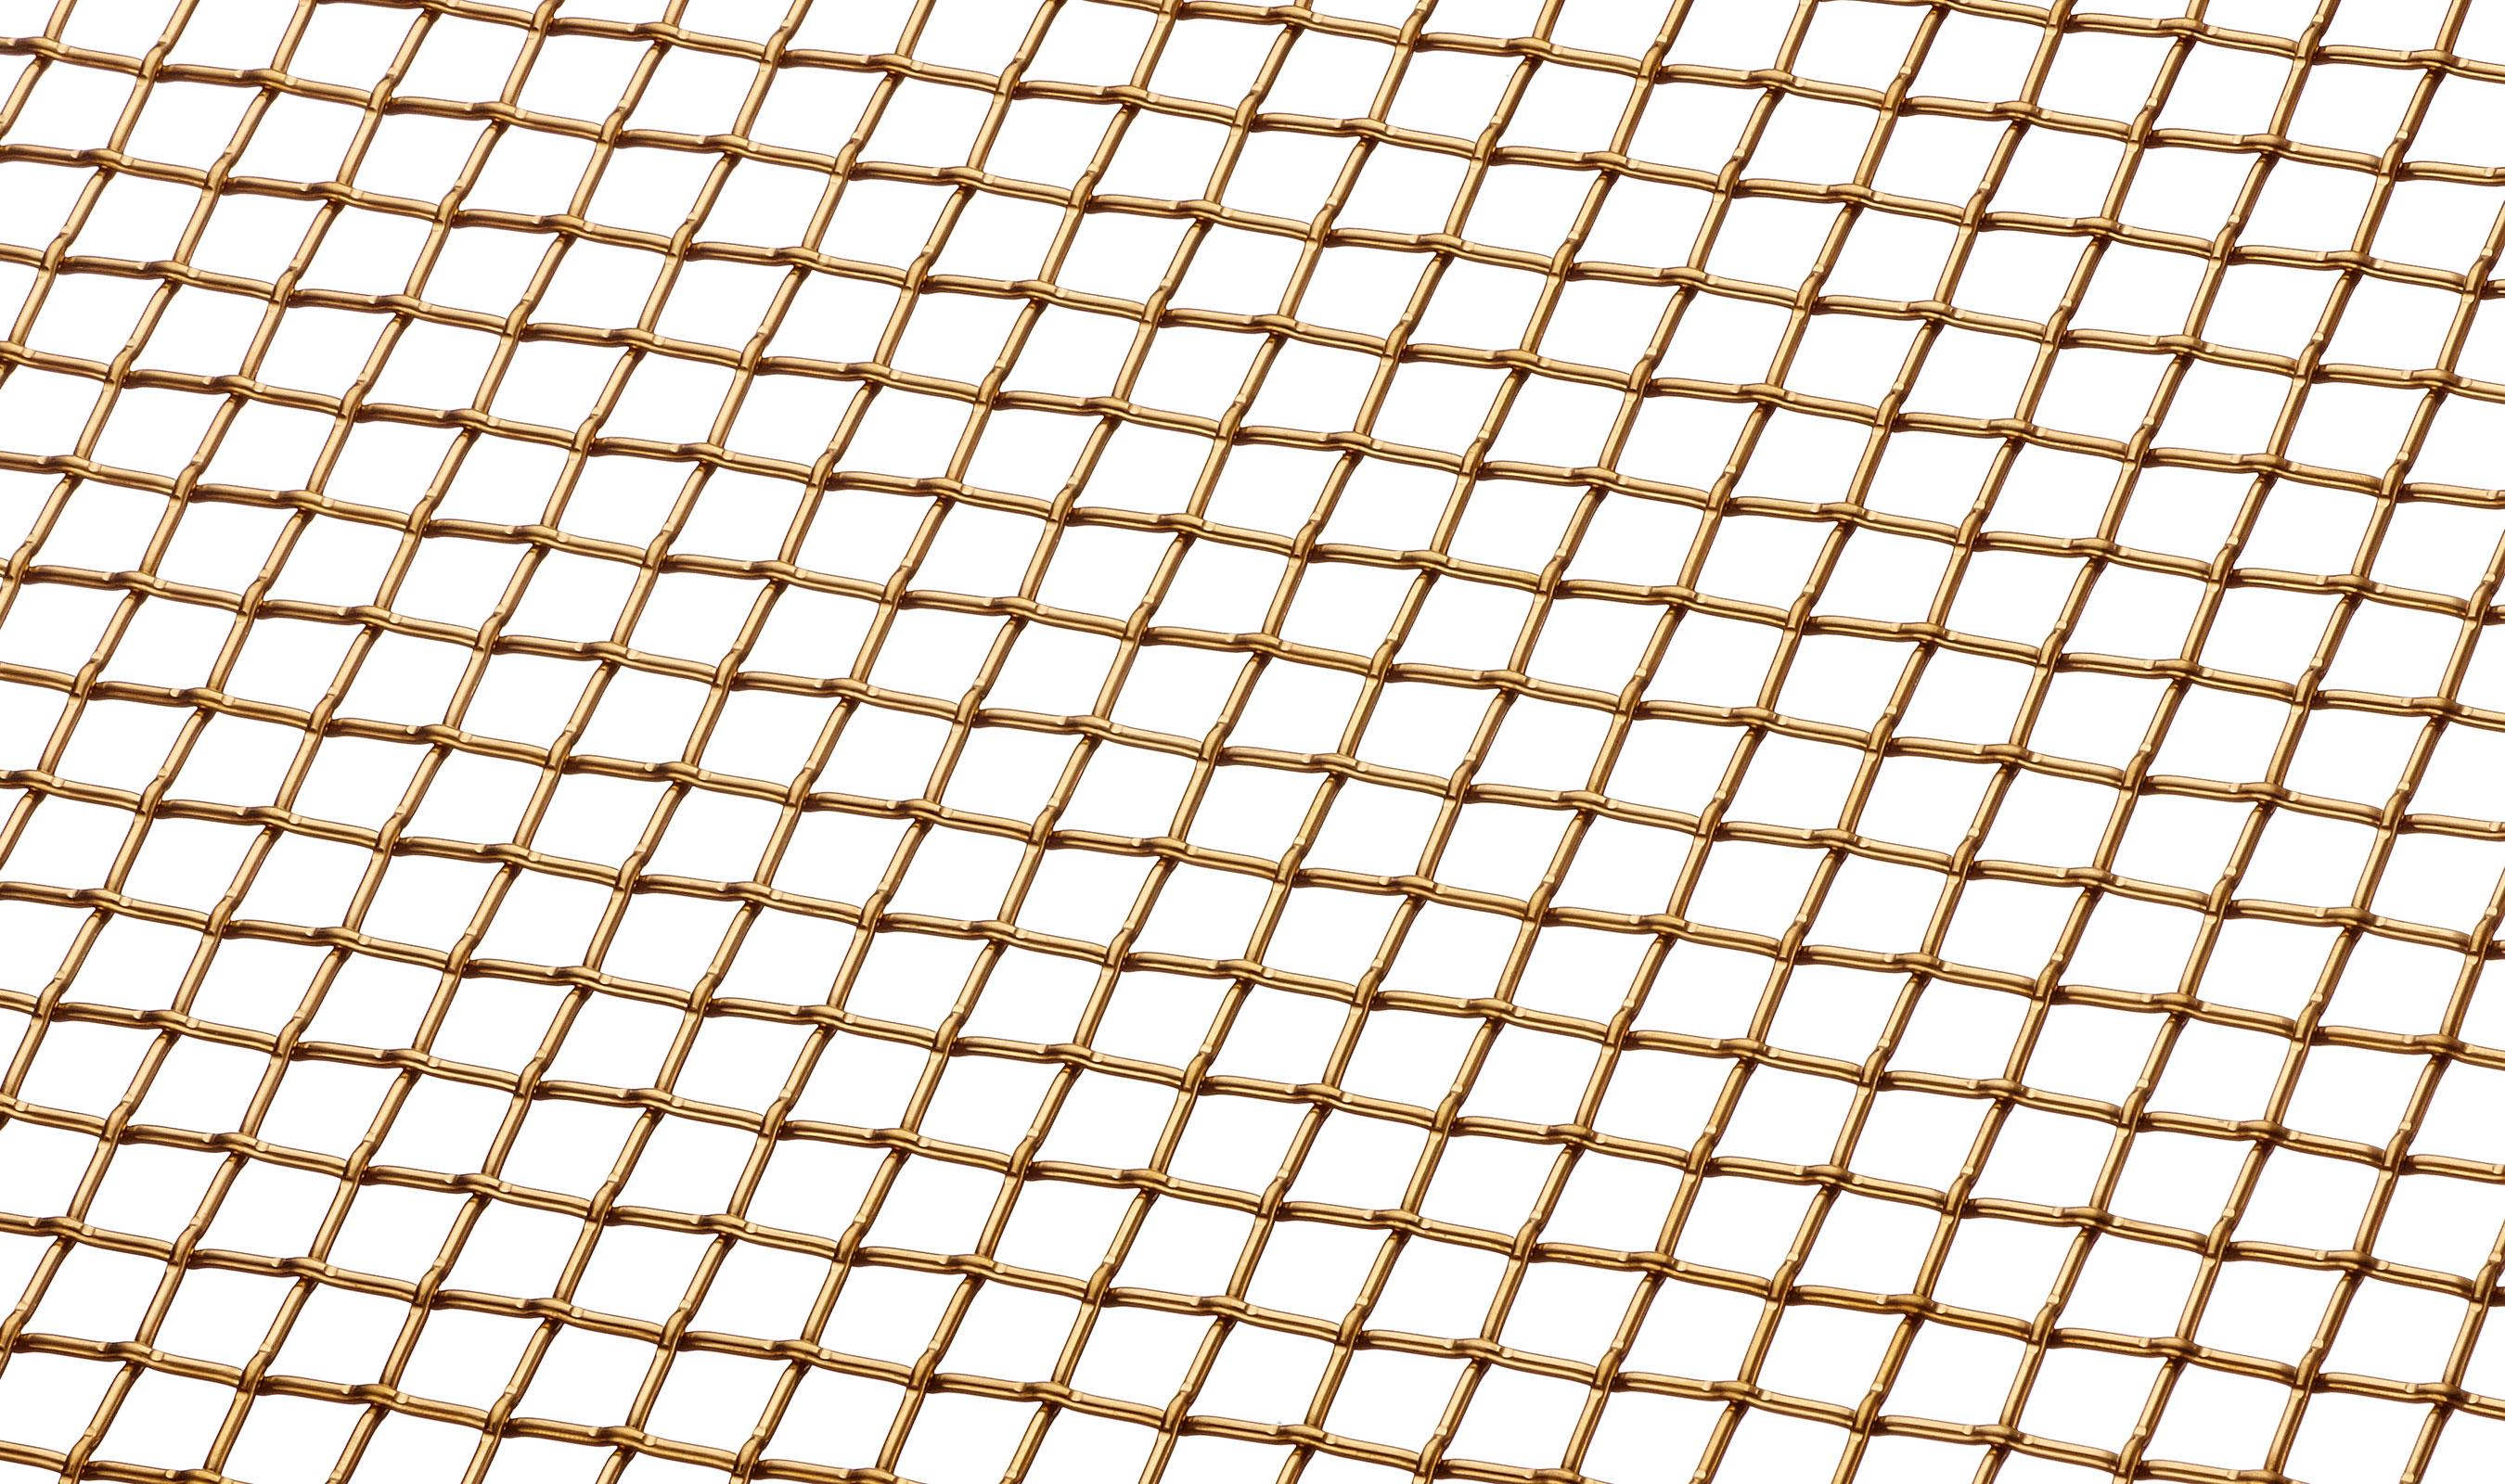 L-441 Angle in Bronze Woven Wire Mesh